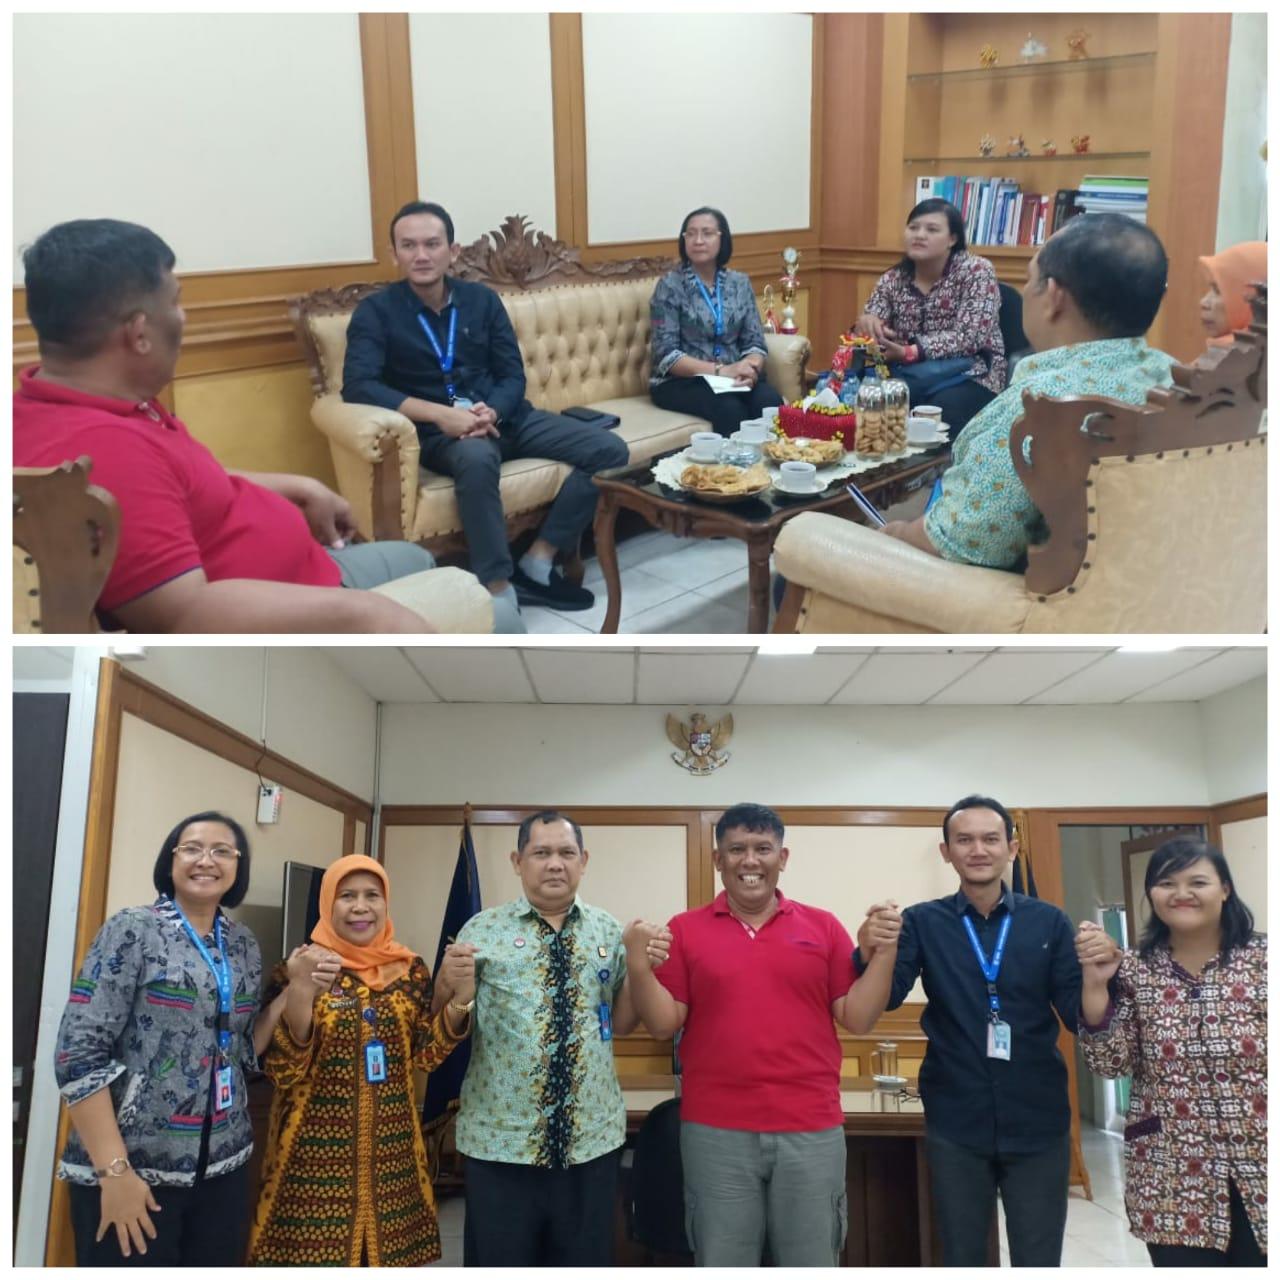 Koordinasi dalam Rangka Pelaksanaan Advokasi di Kantor Wilayah Kementerian Hukum dan HAM Provinsi DKI Jakarta